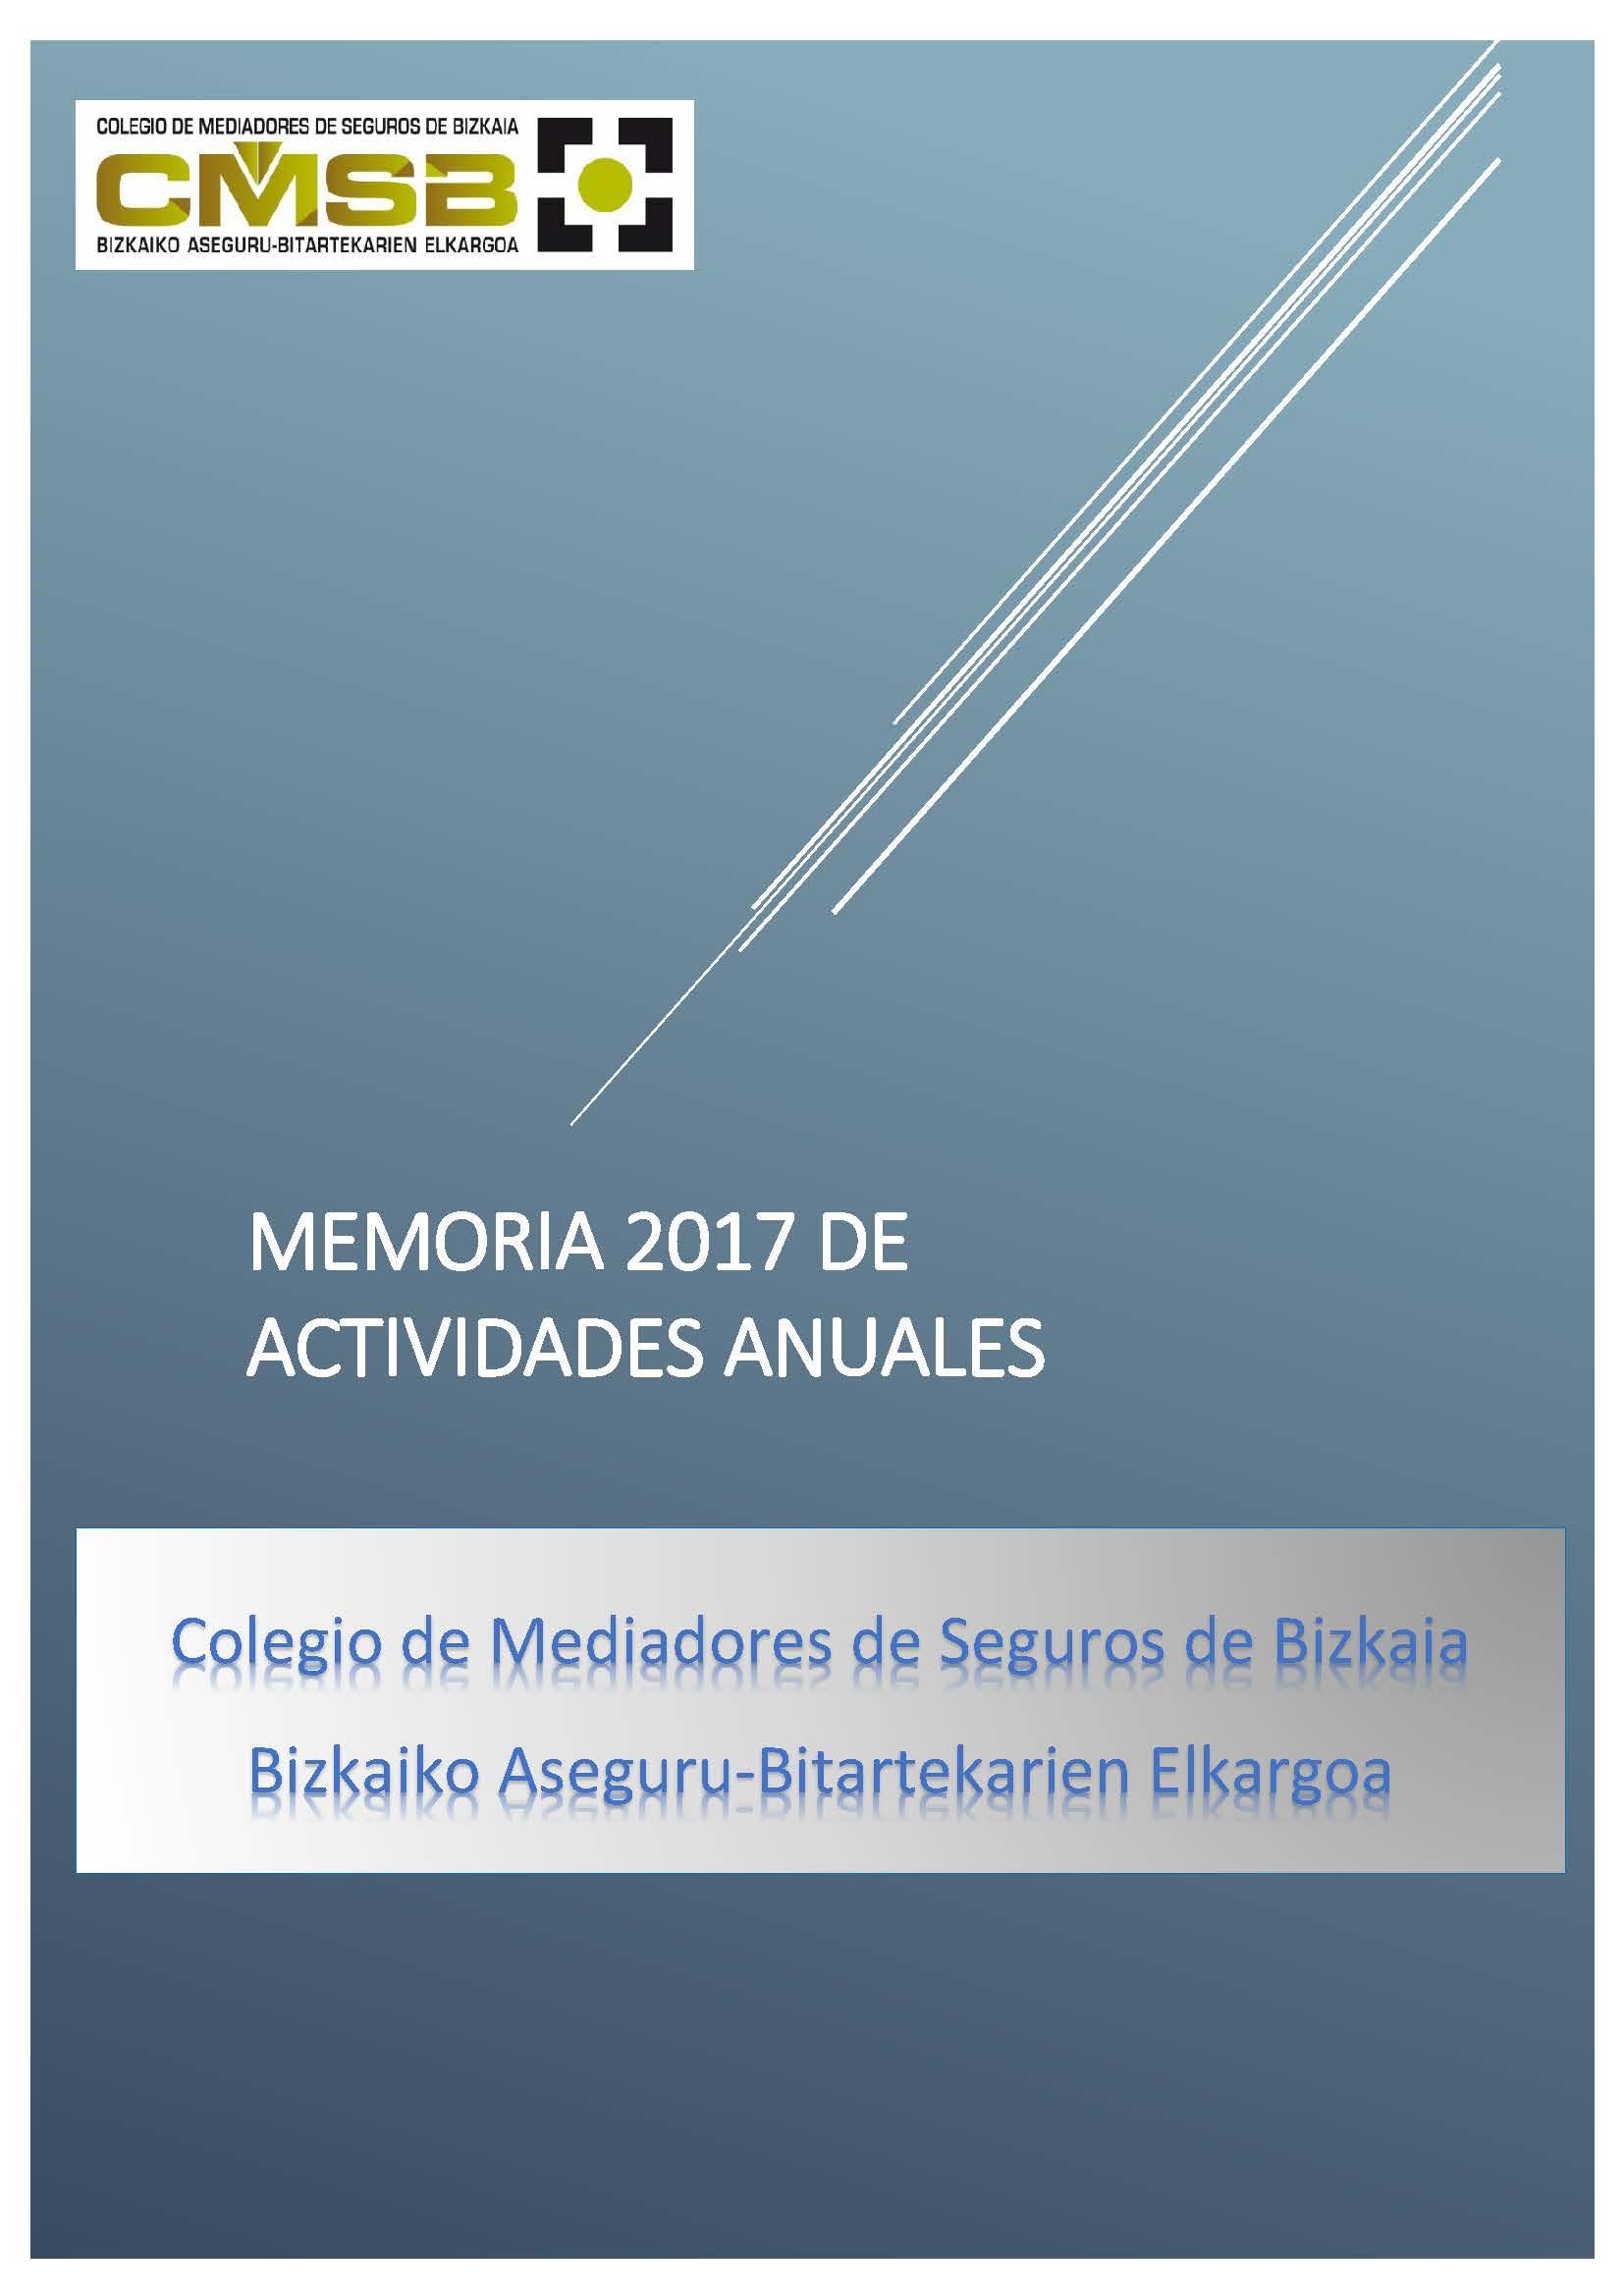 CMSAB - Memoria 2016